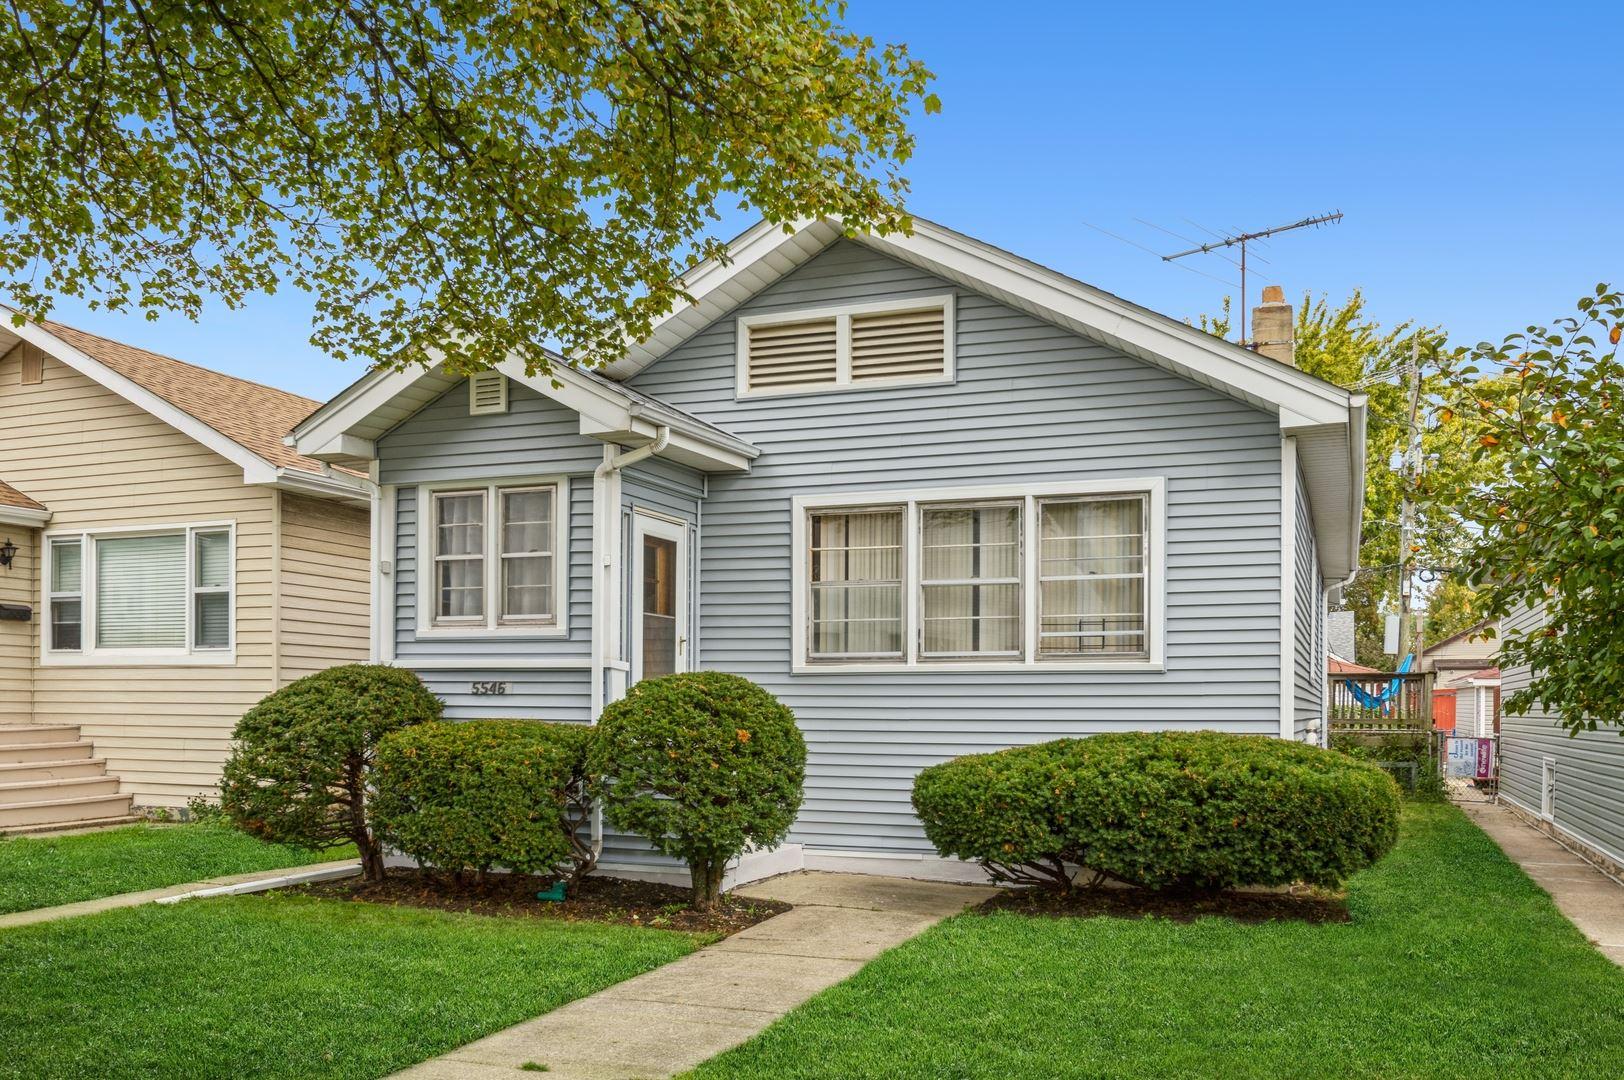 5546 W Waveland Avenue, Chicago, IL 60641 - #: 11252455